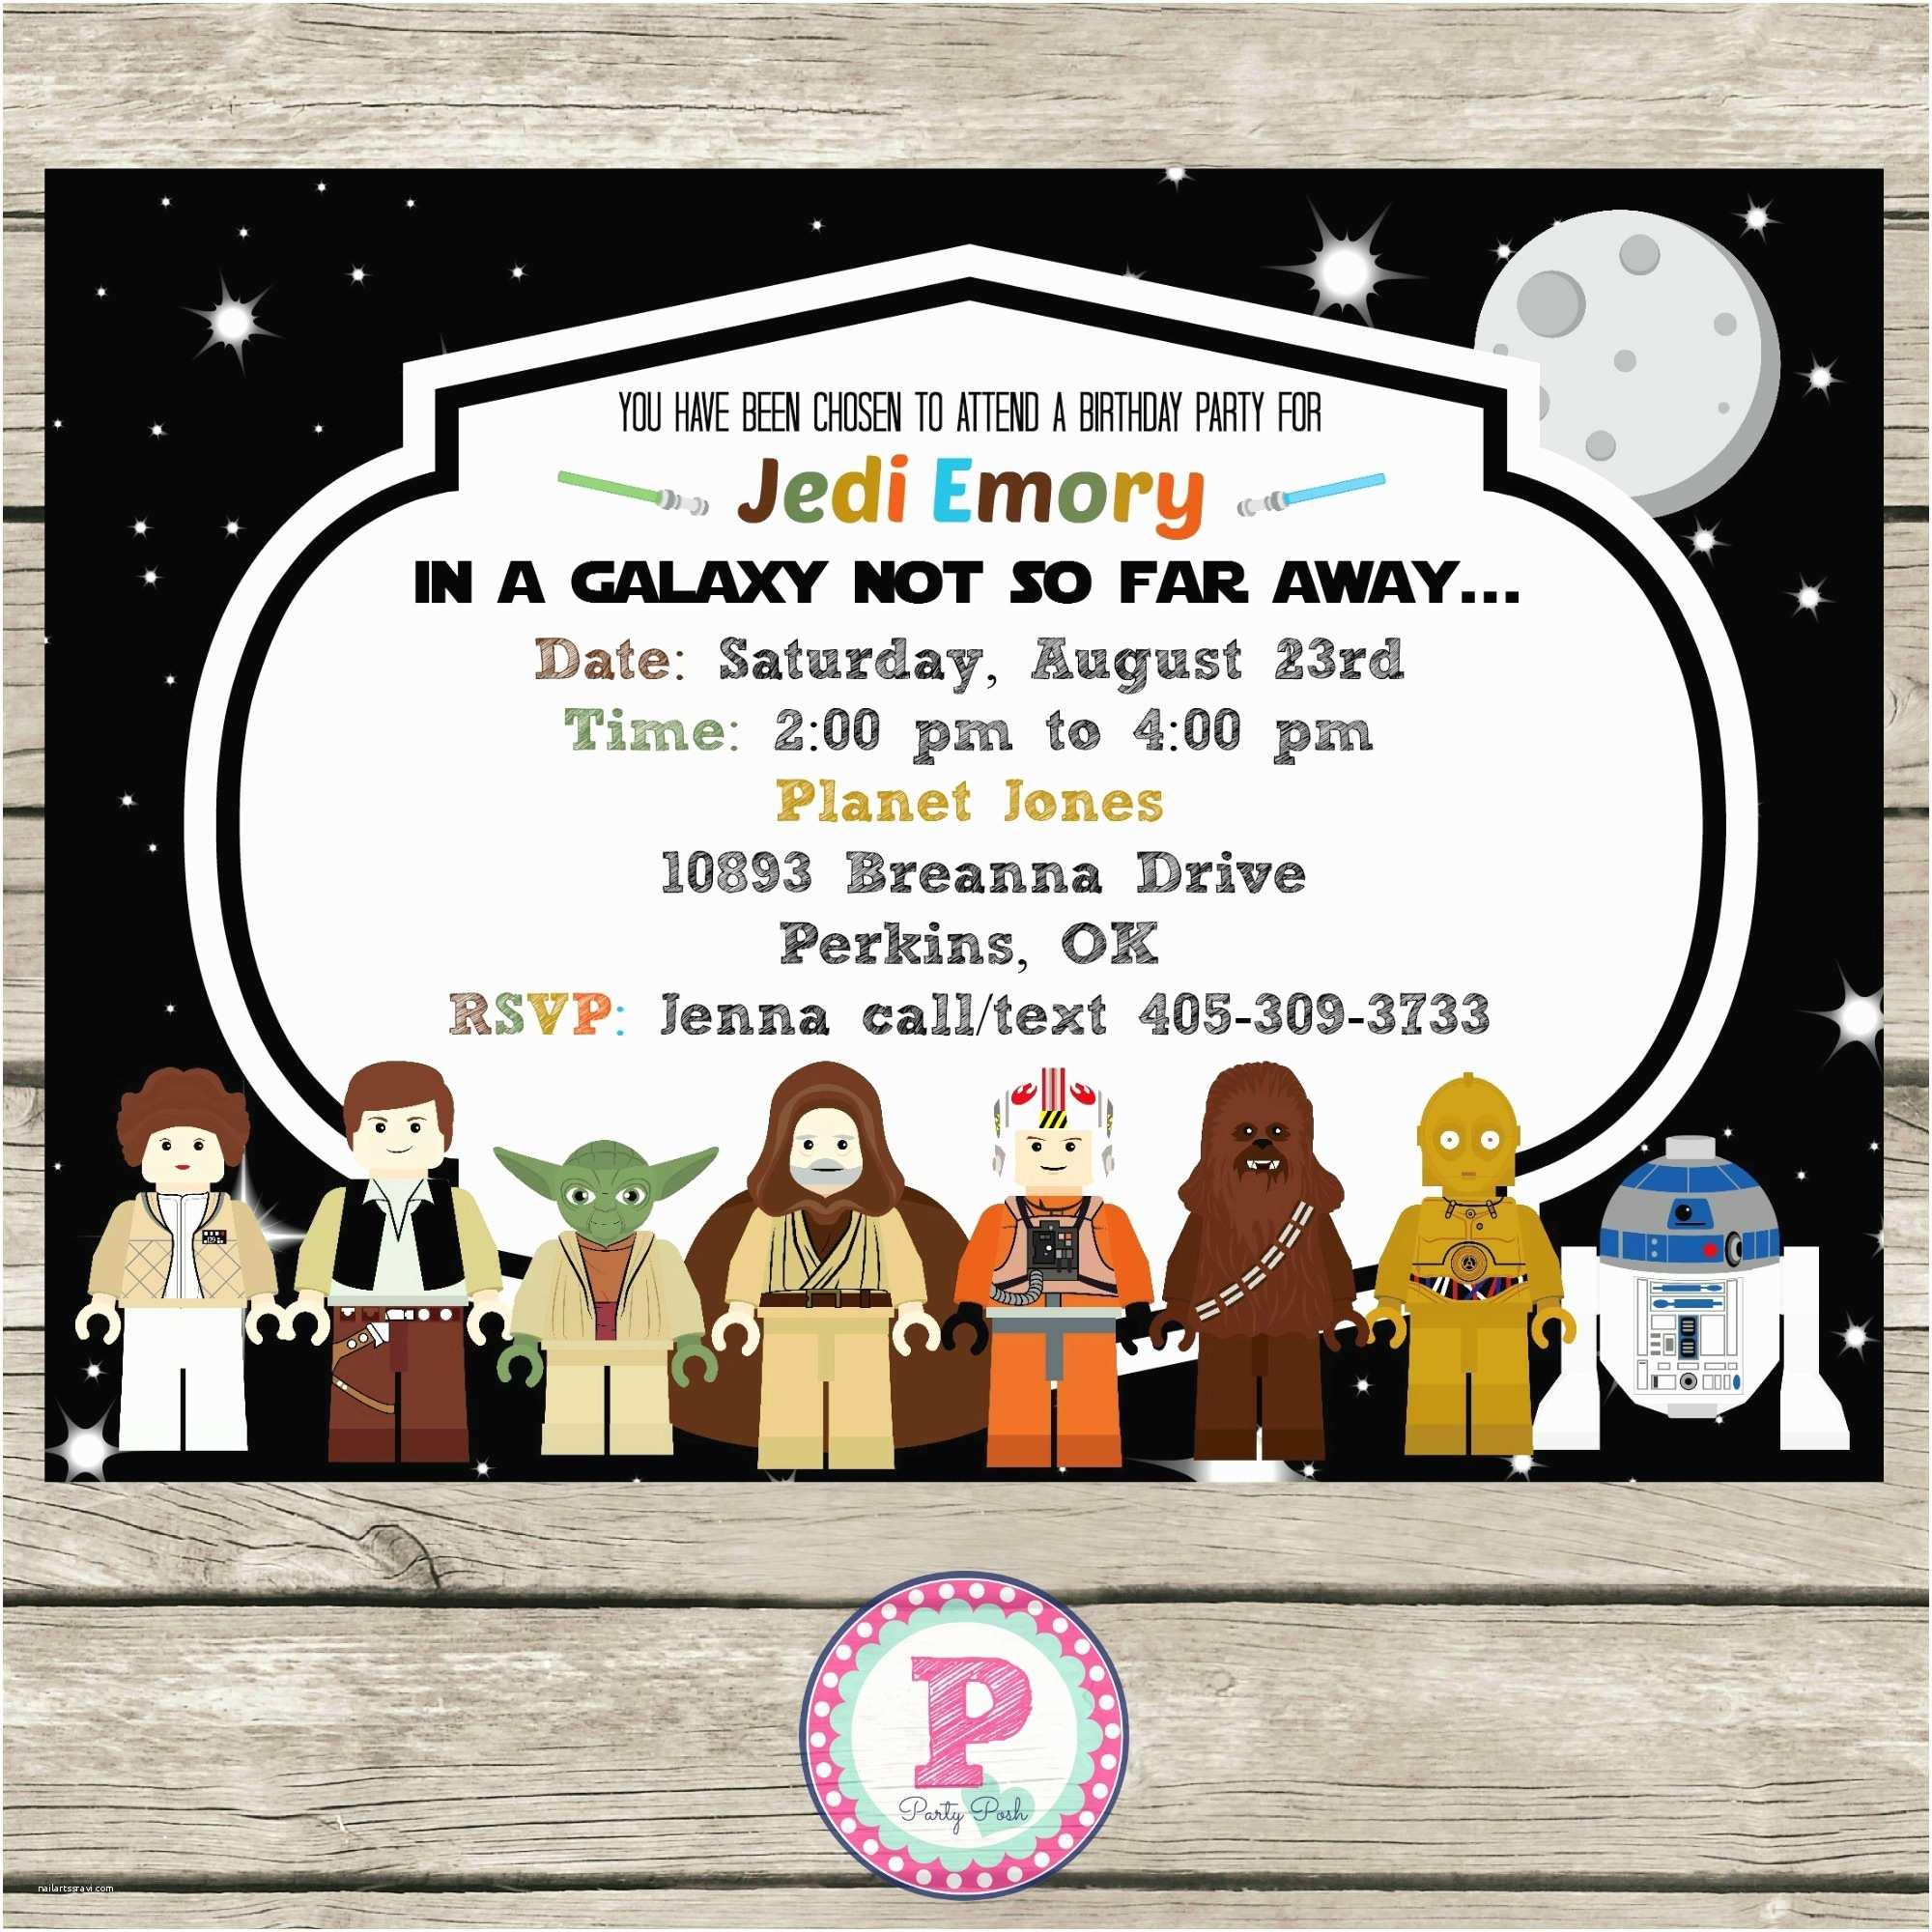 Star Wars Party Invitations Star Wars Lego Birthday Party Ideas Invitations